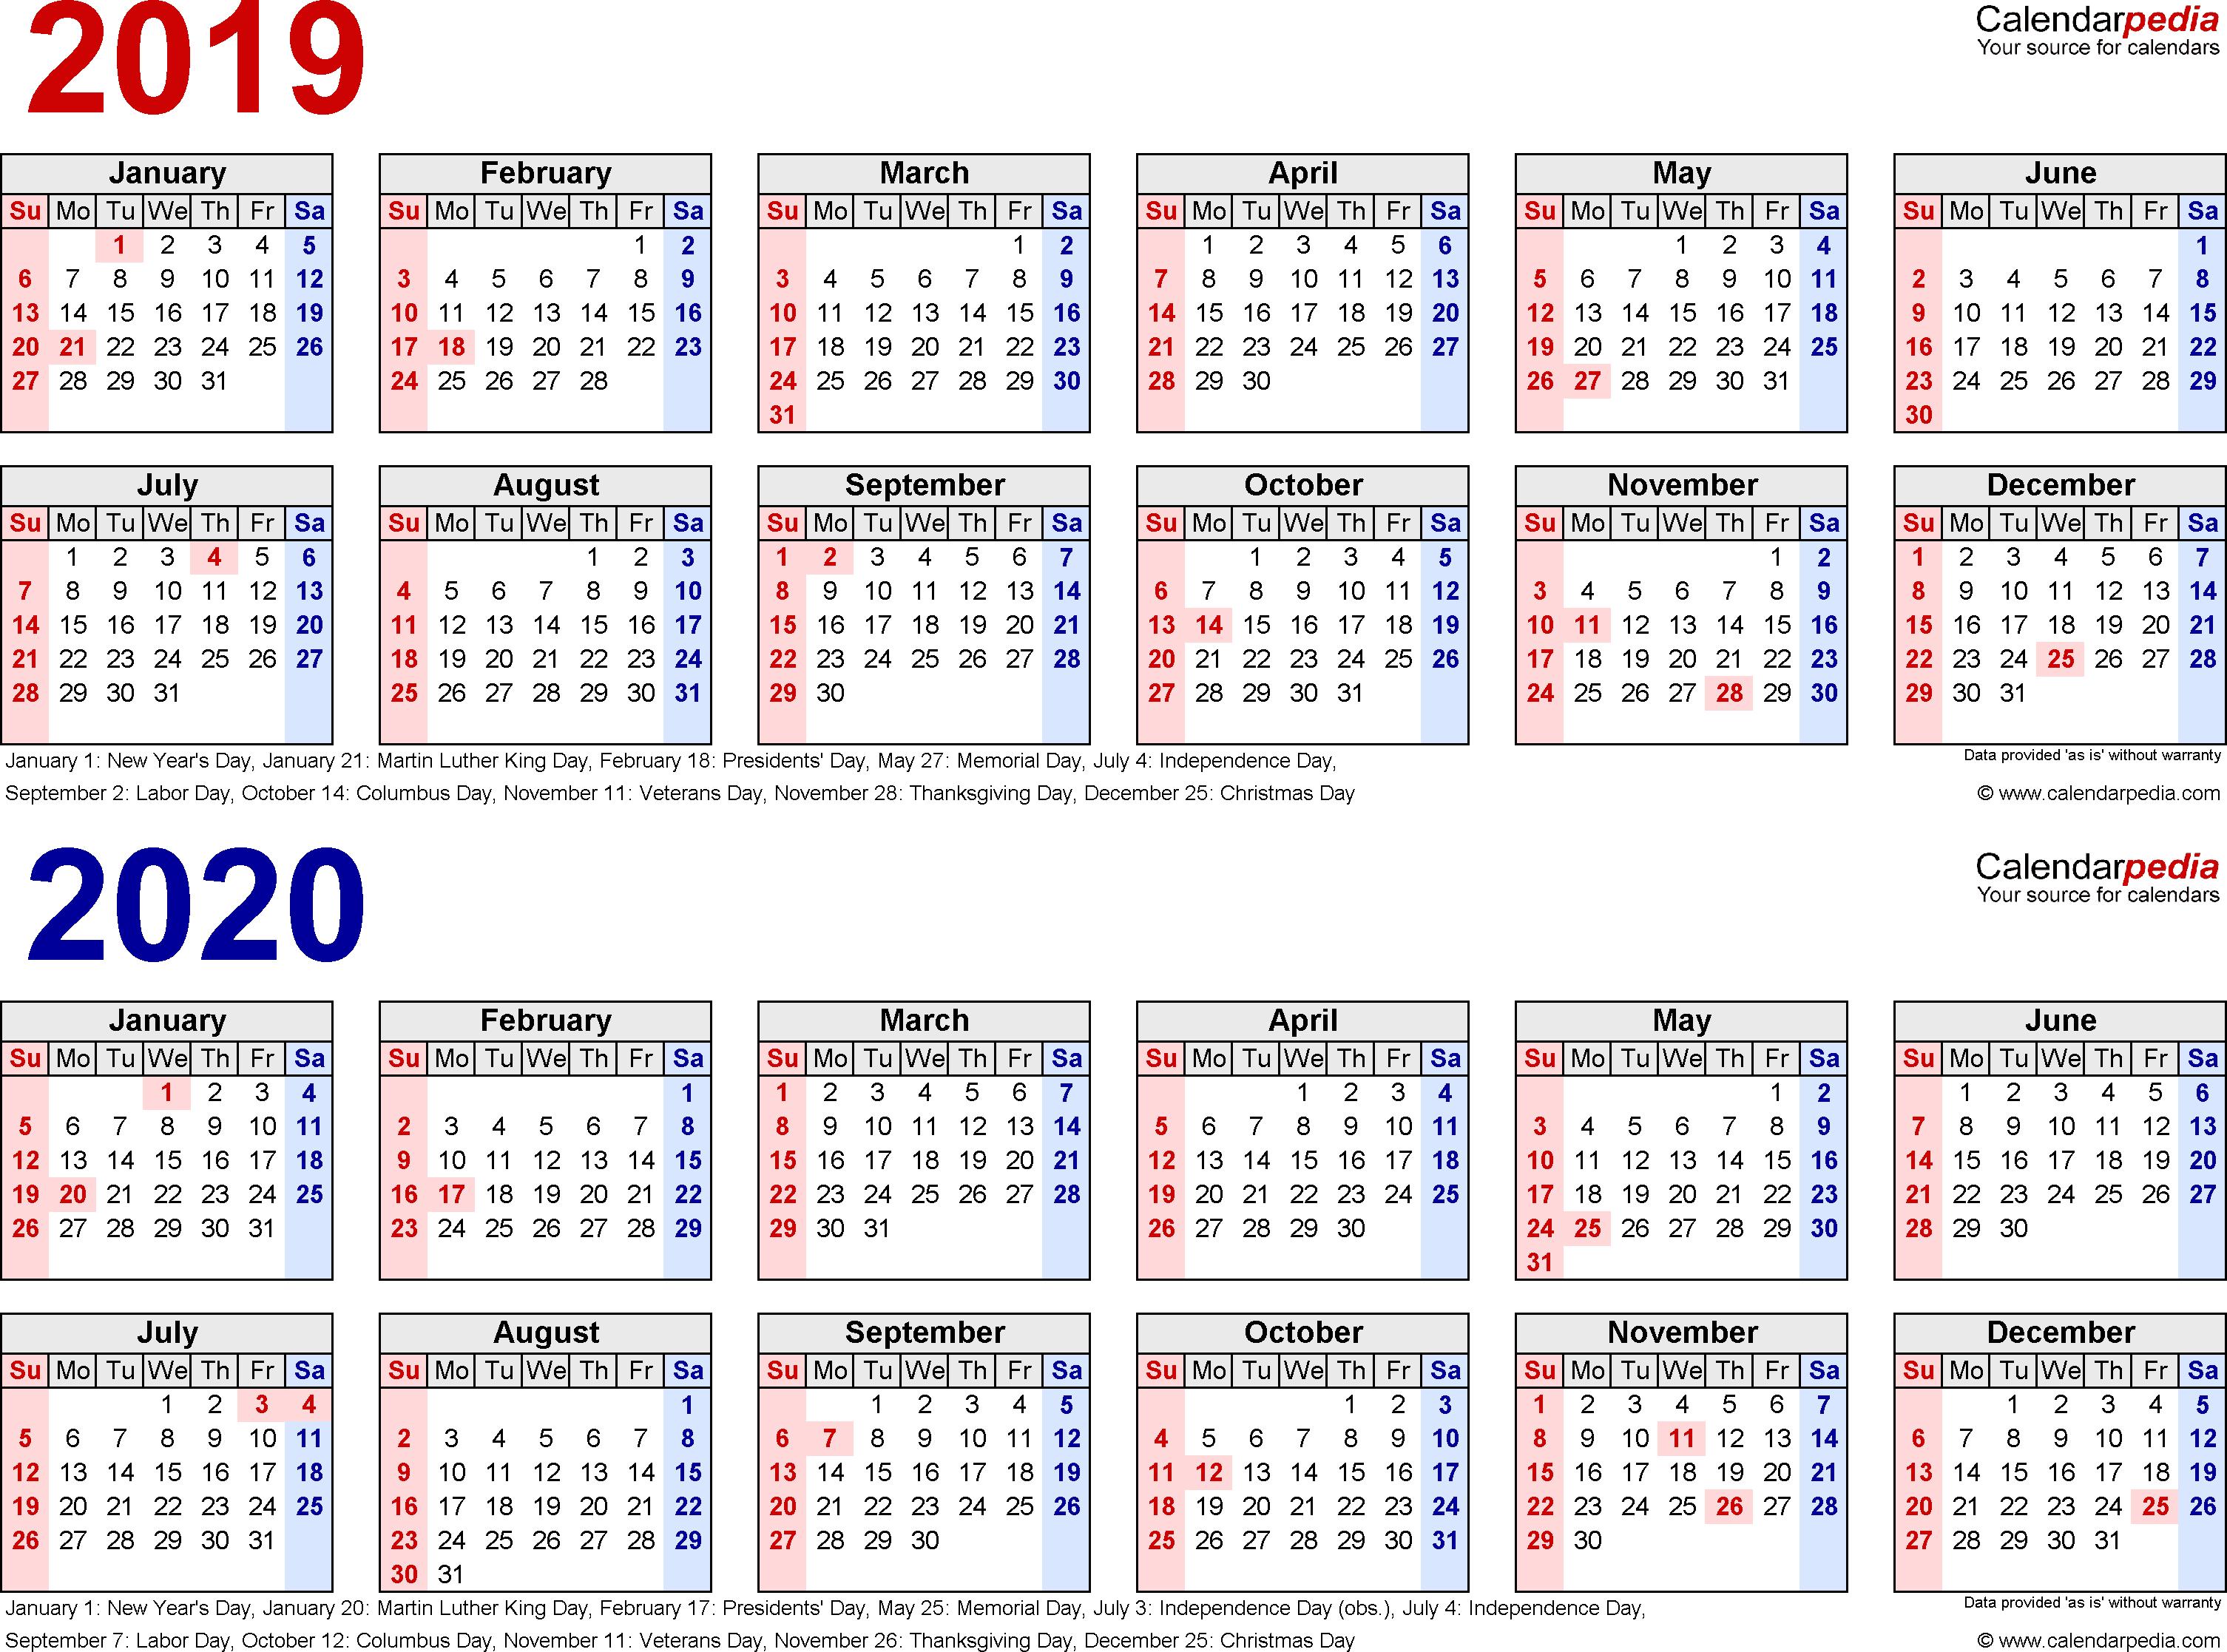 2019-2020 Calendar - Free Printable Two-Year Pdf Calendars for 2019-2020 Calendar Printable Free No Download